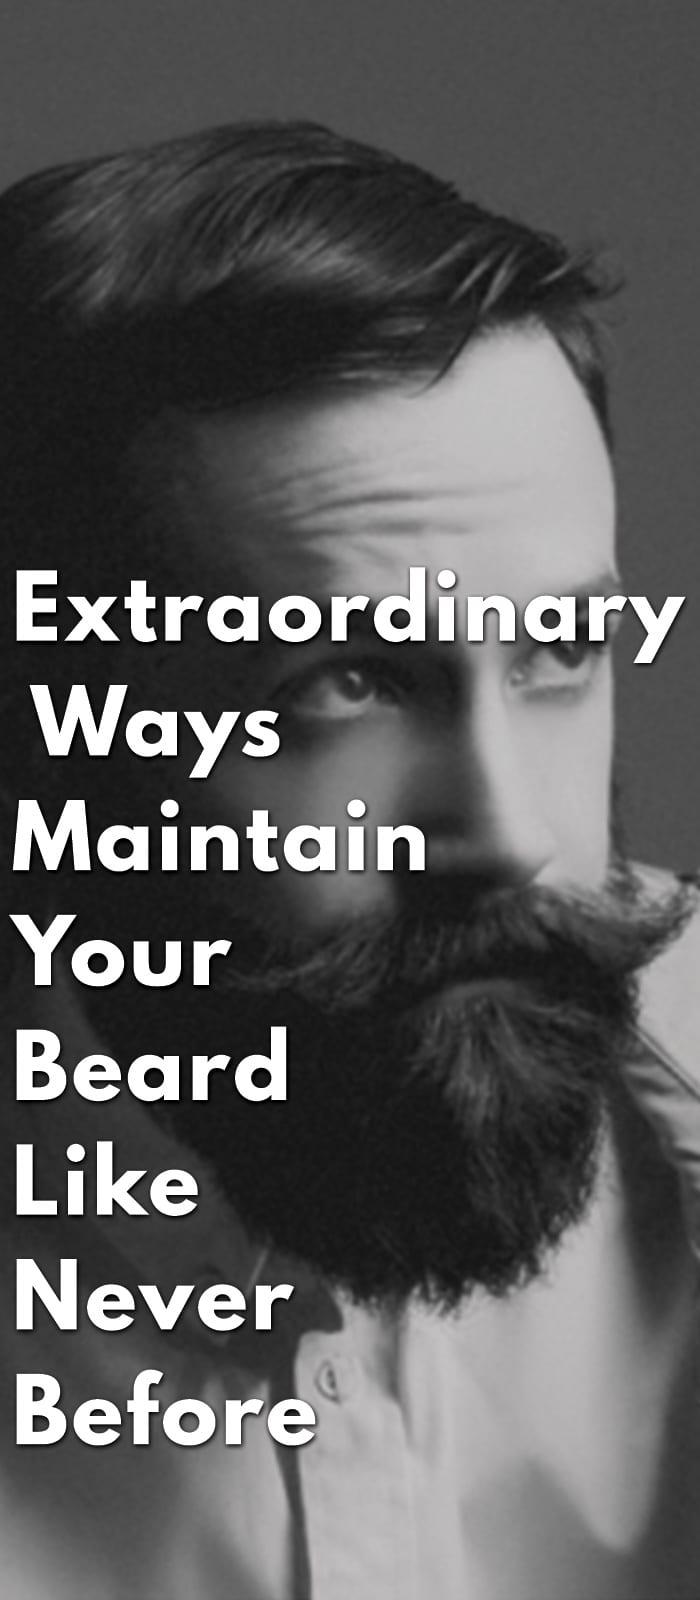 Extraordinary-Ways-Maintain-Your-Beard-Like-Never-Before